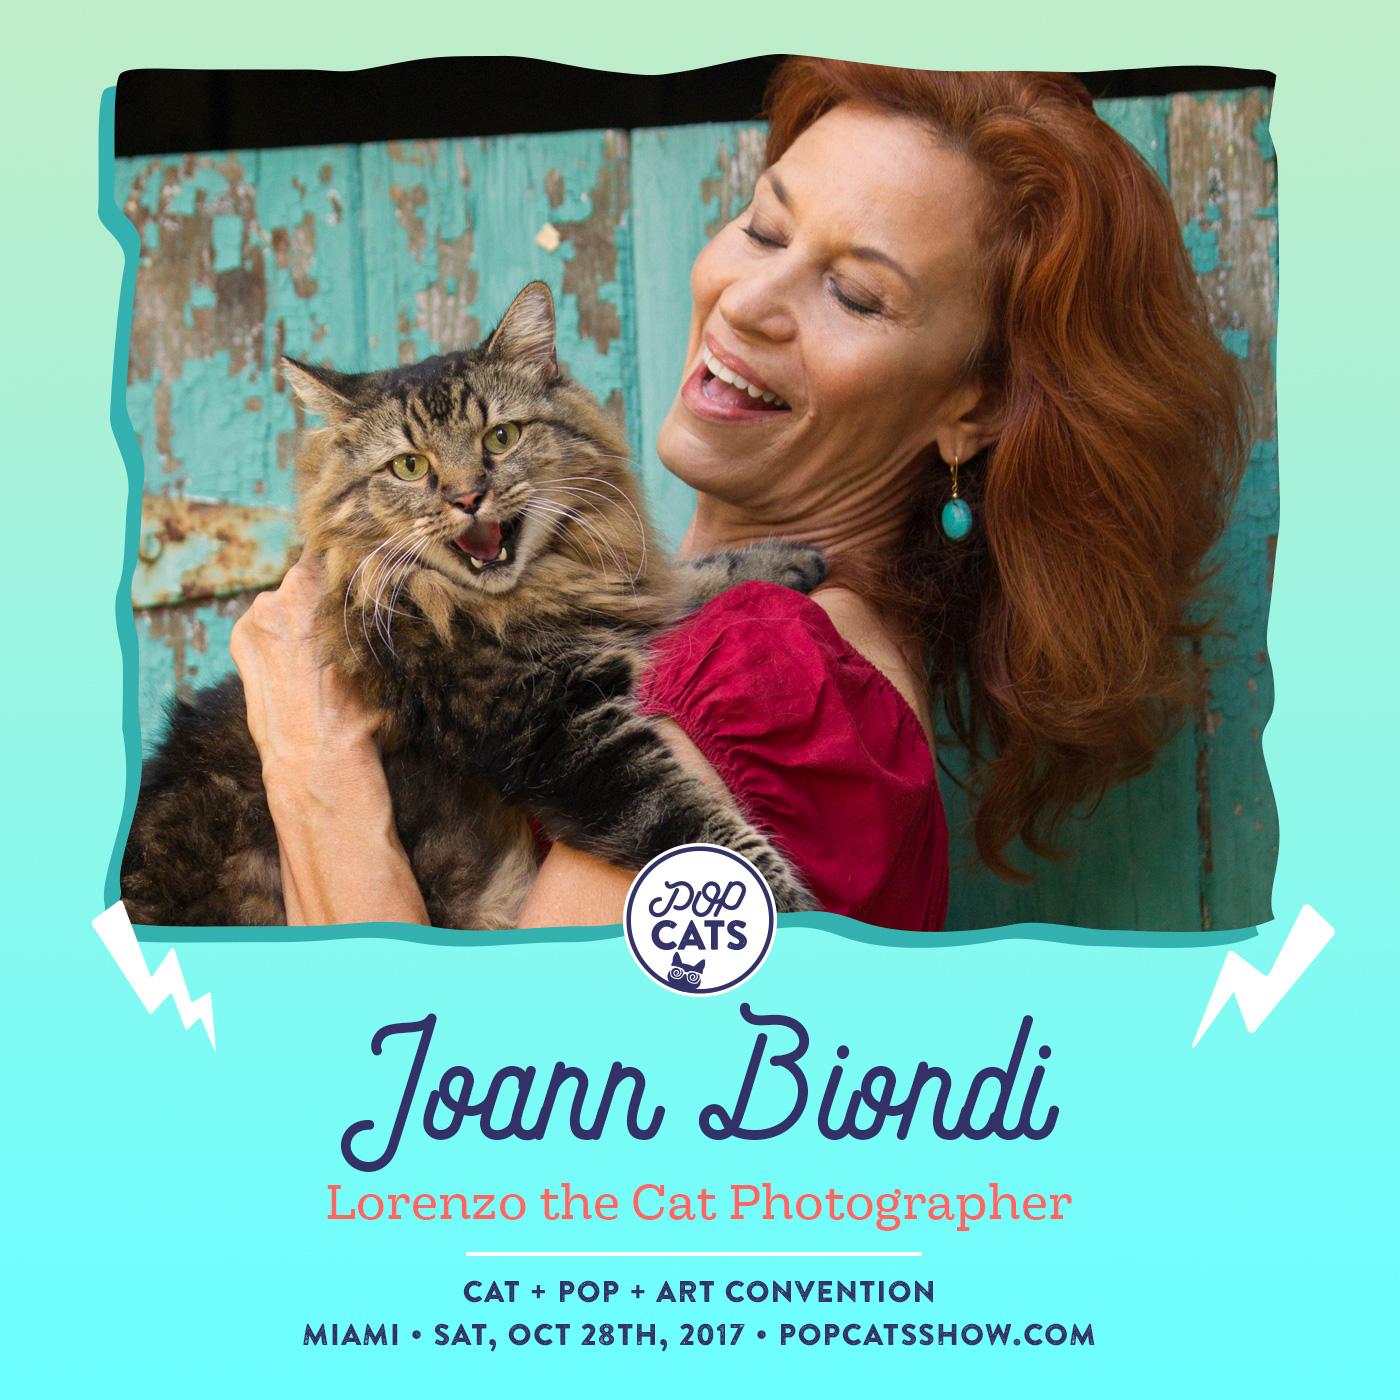 joann-biondi-pop-cats